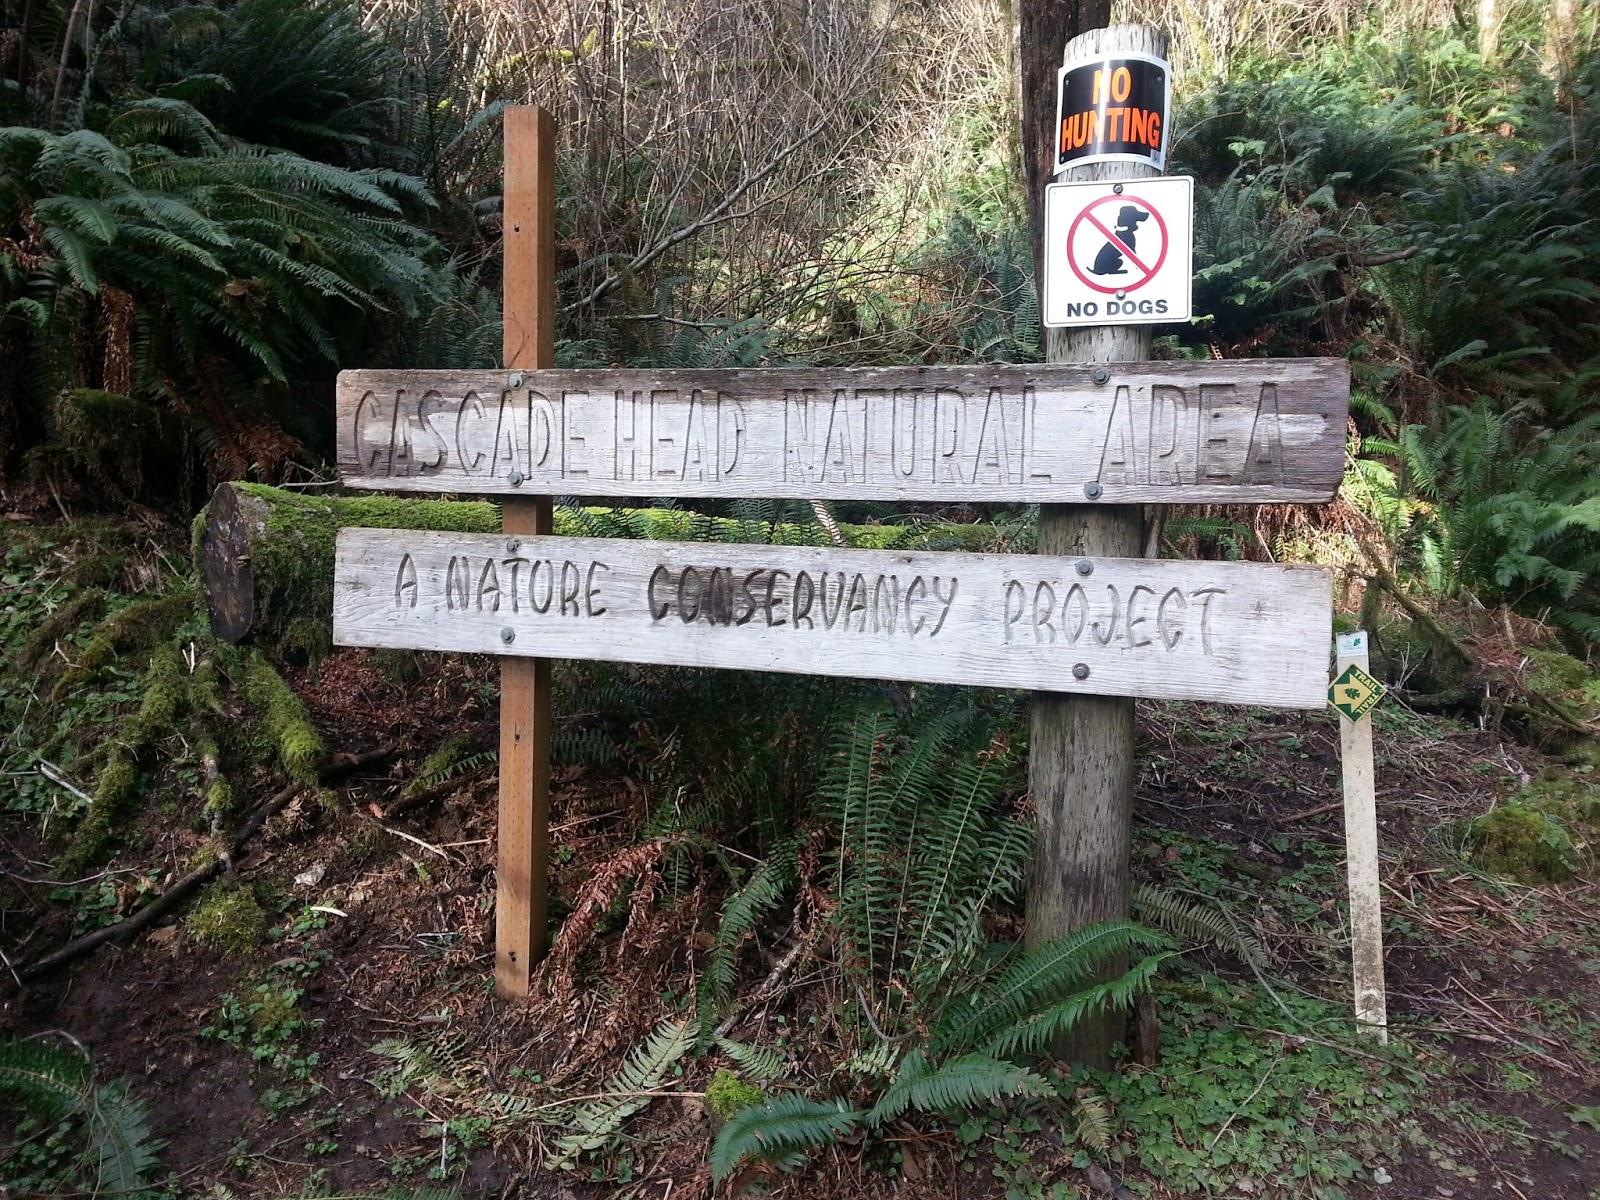 Cascade Head Natural Area Hiking Trail Lincoln City Oregon